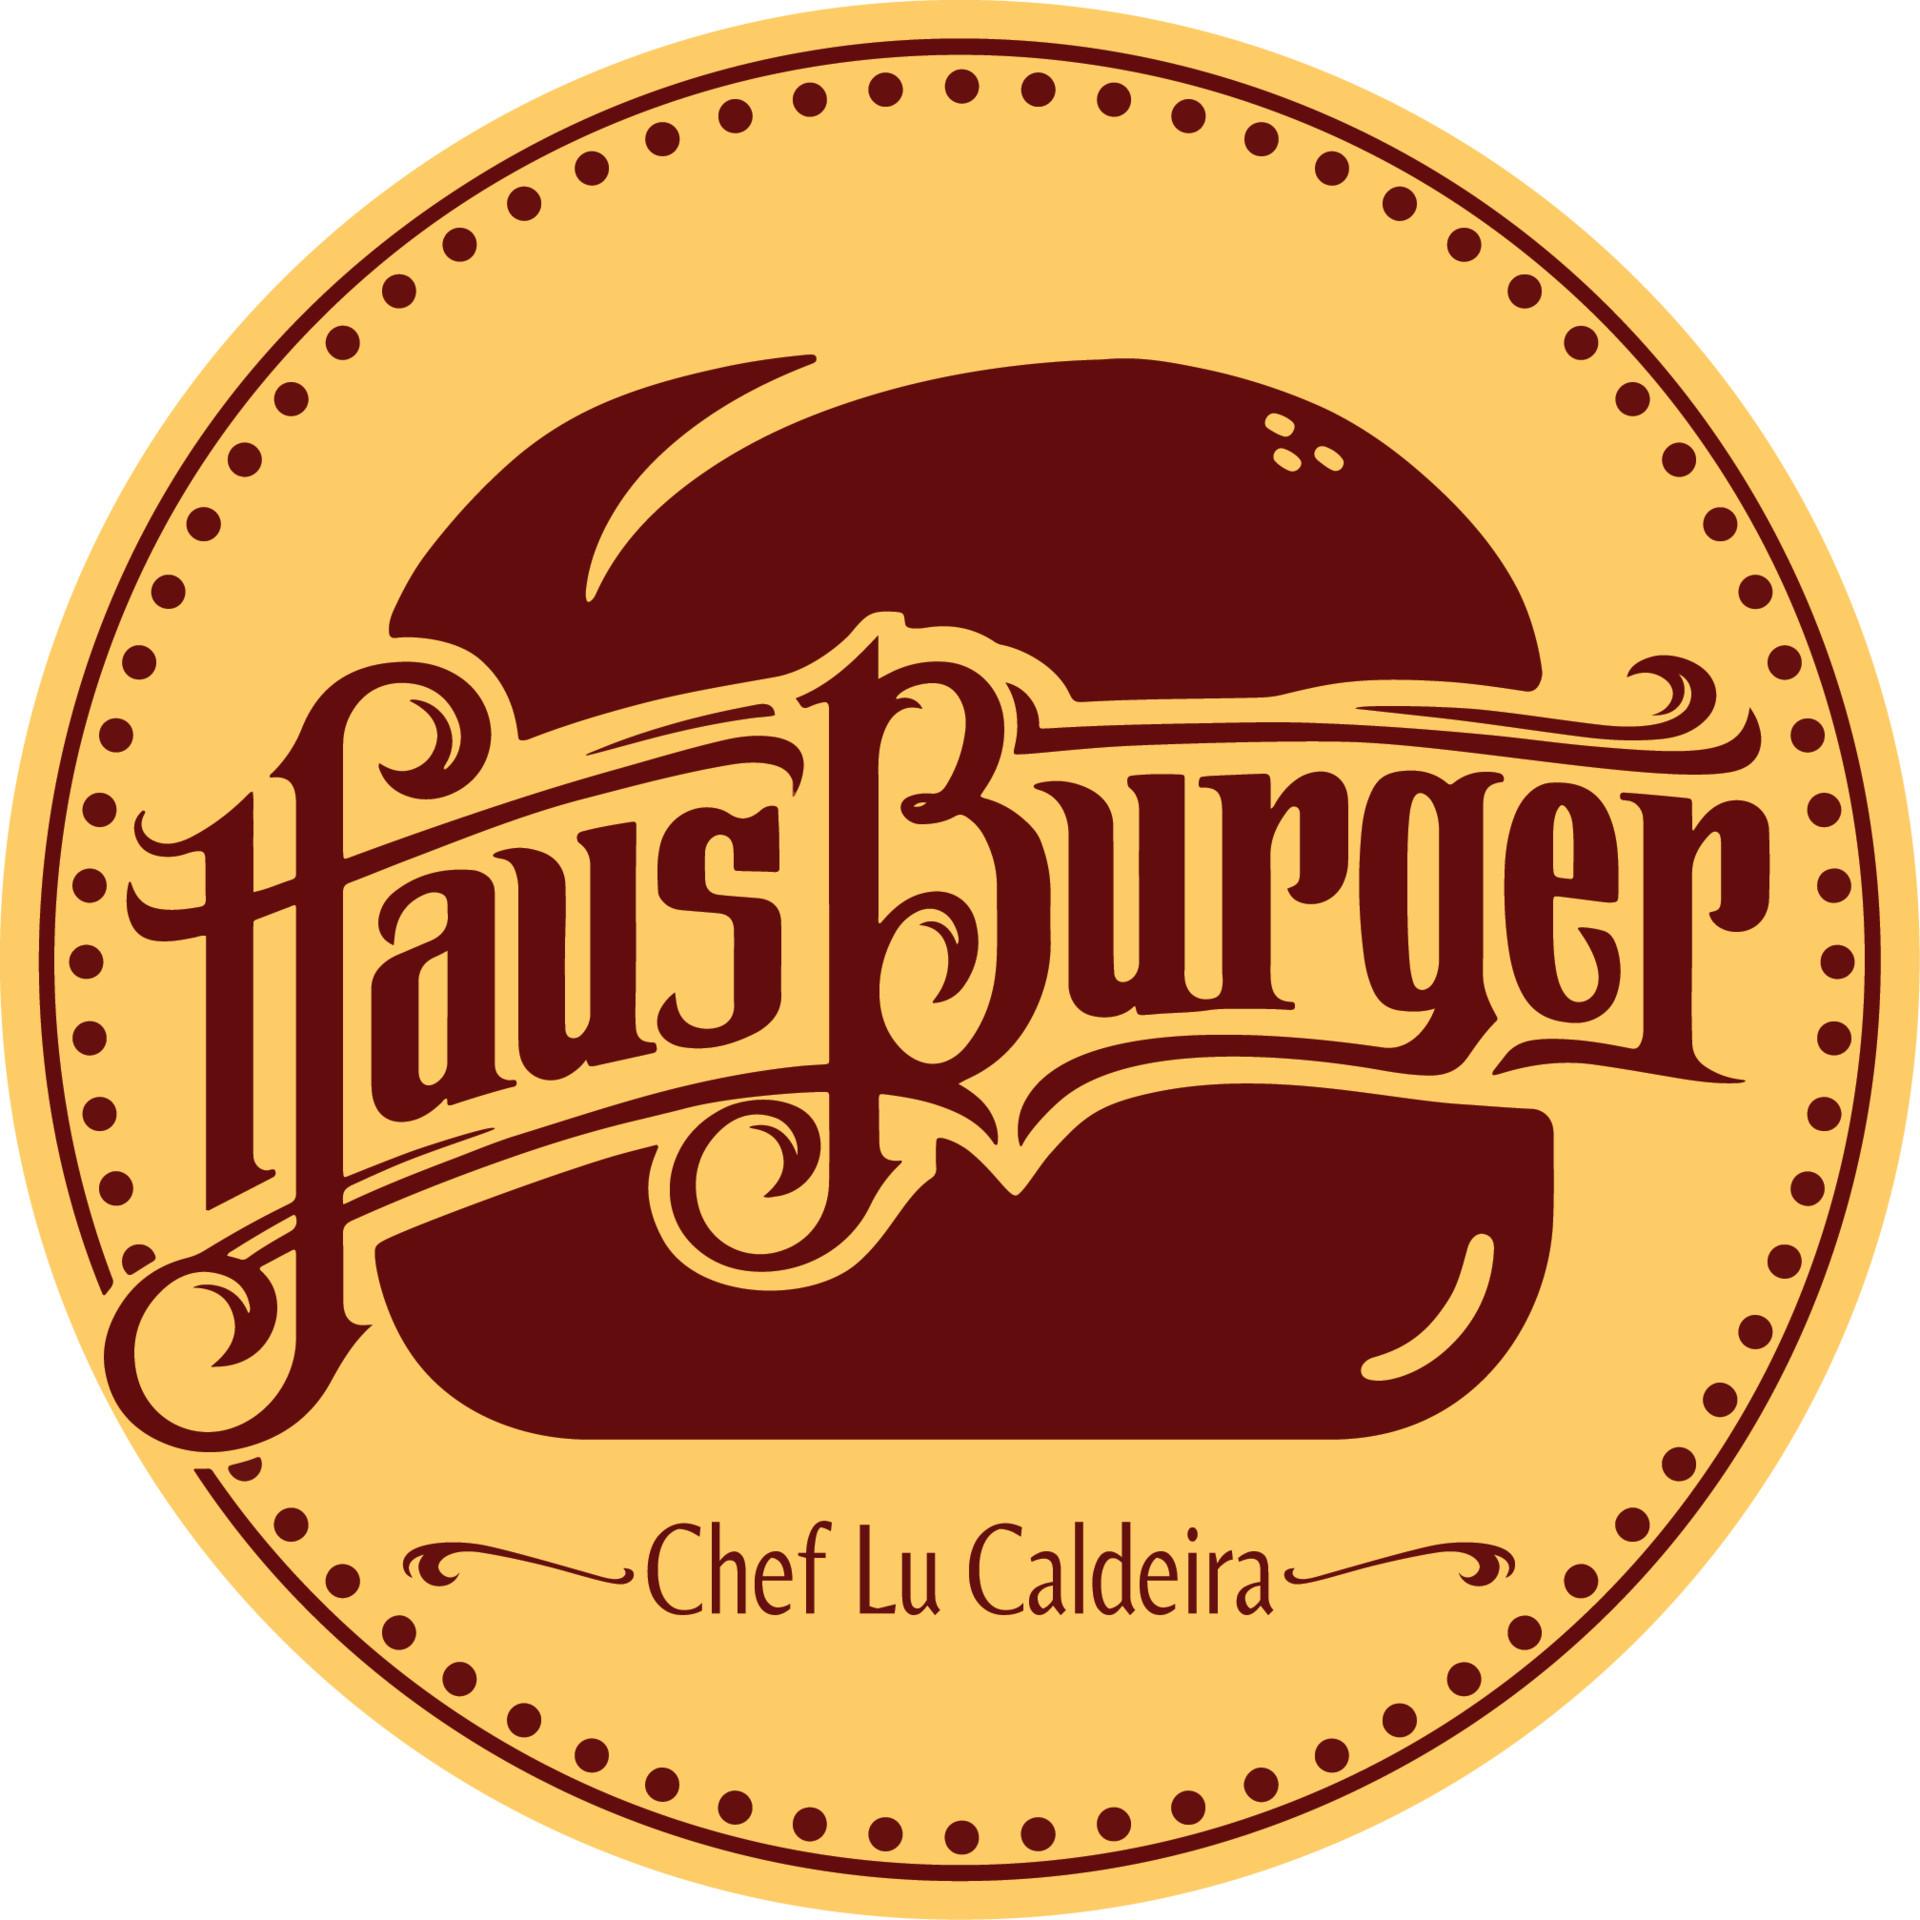 Alexandre Rosa Haus Burger Logo Design